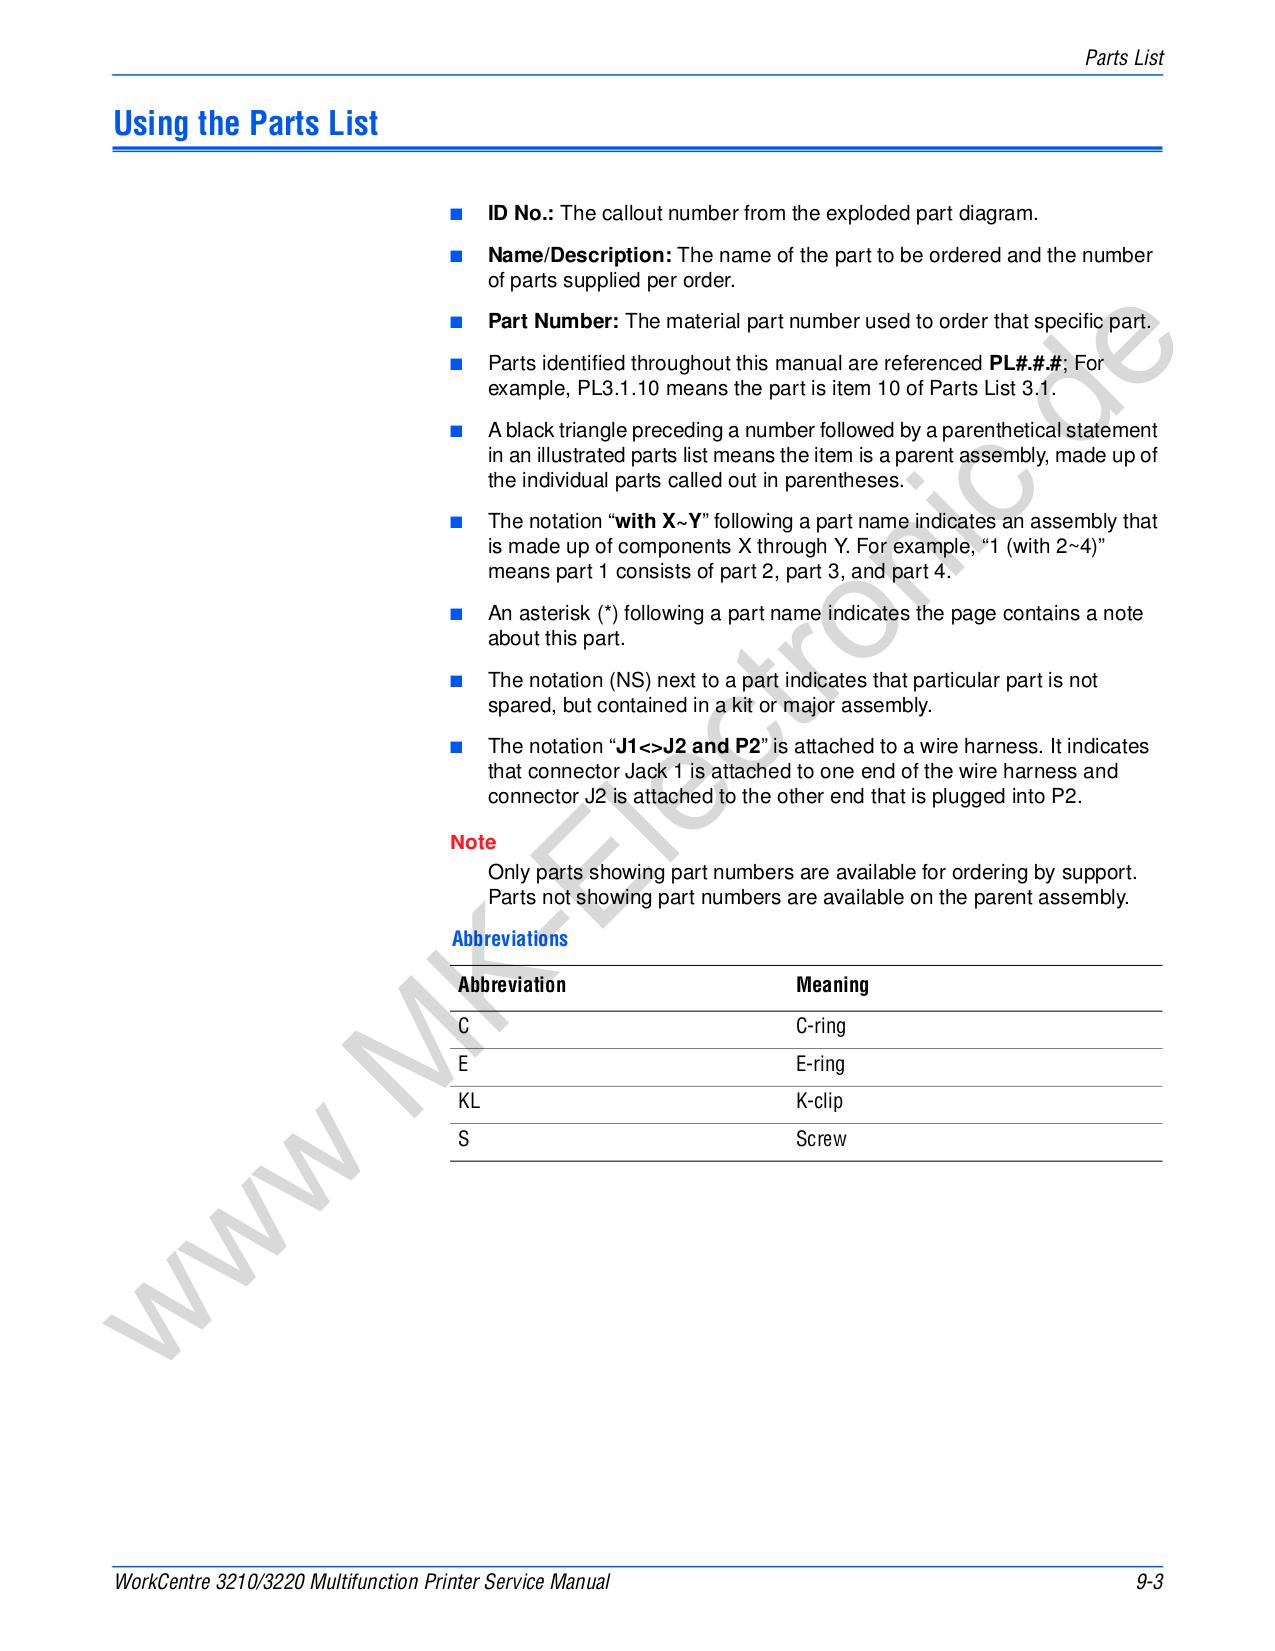 PDF manual for Xerox Multifunction Printer WorkCentre 3220